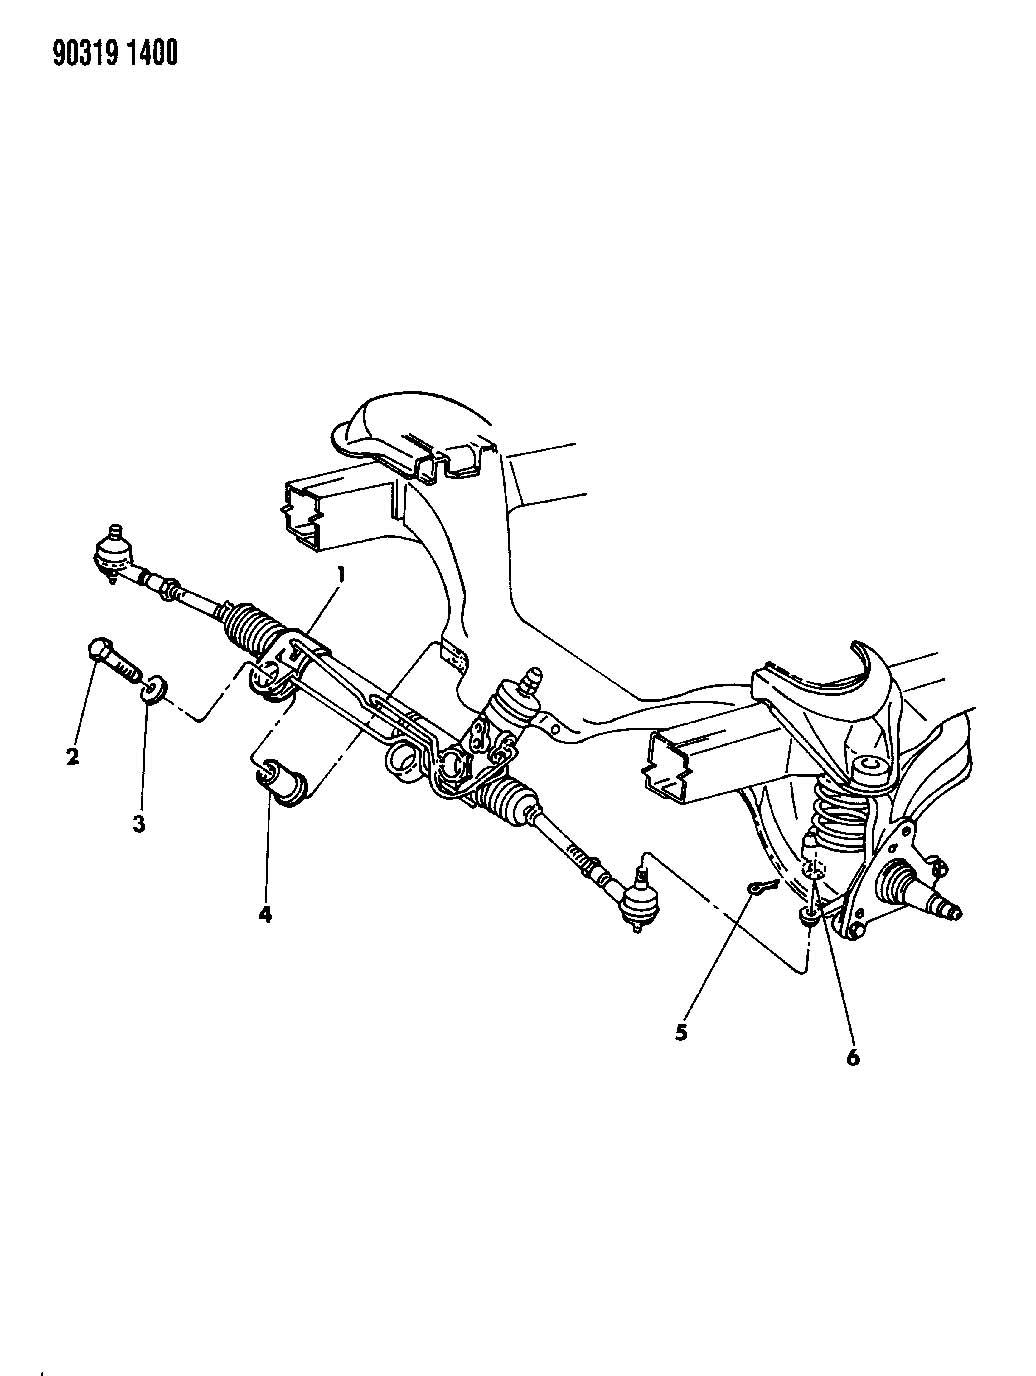 2001 Dodge Neon Control Arm Diagram Html